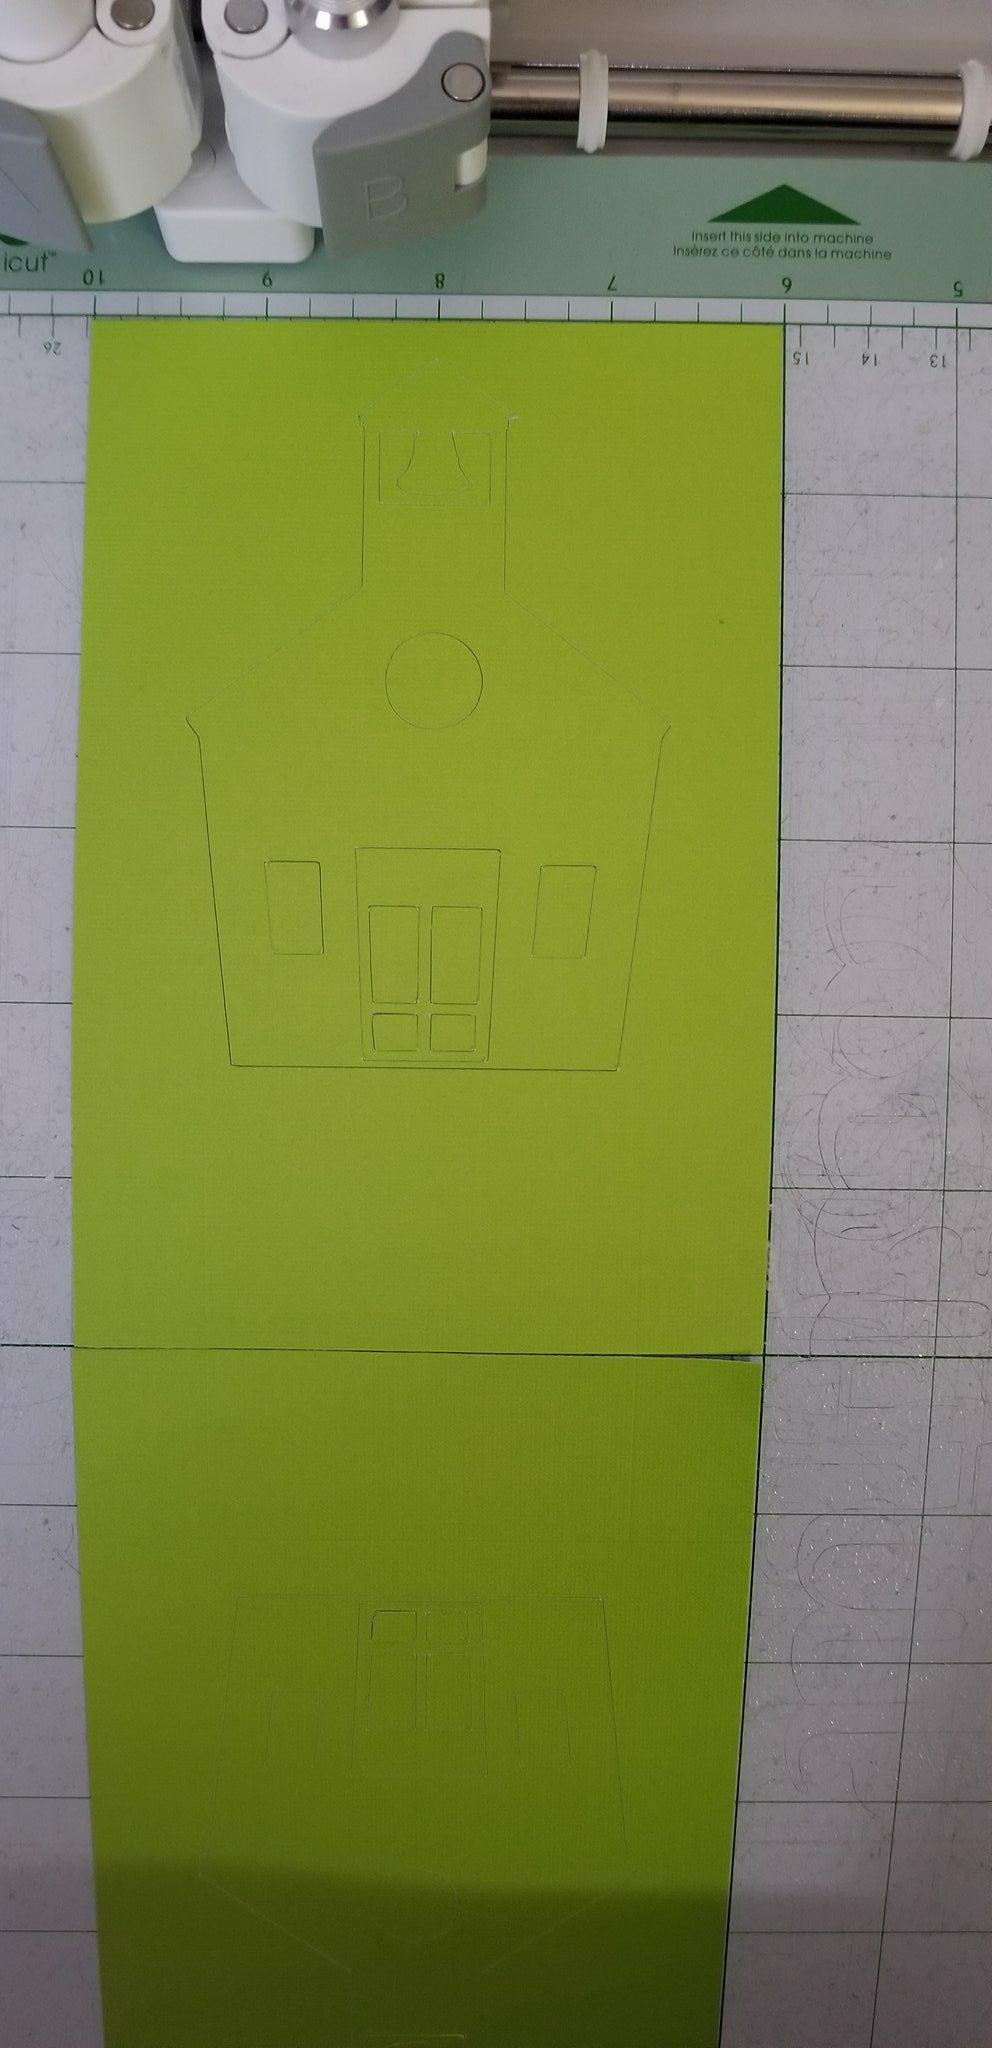 Close up of green schoolhouse cut using Cricut machine for teacher appreciation gift ideas